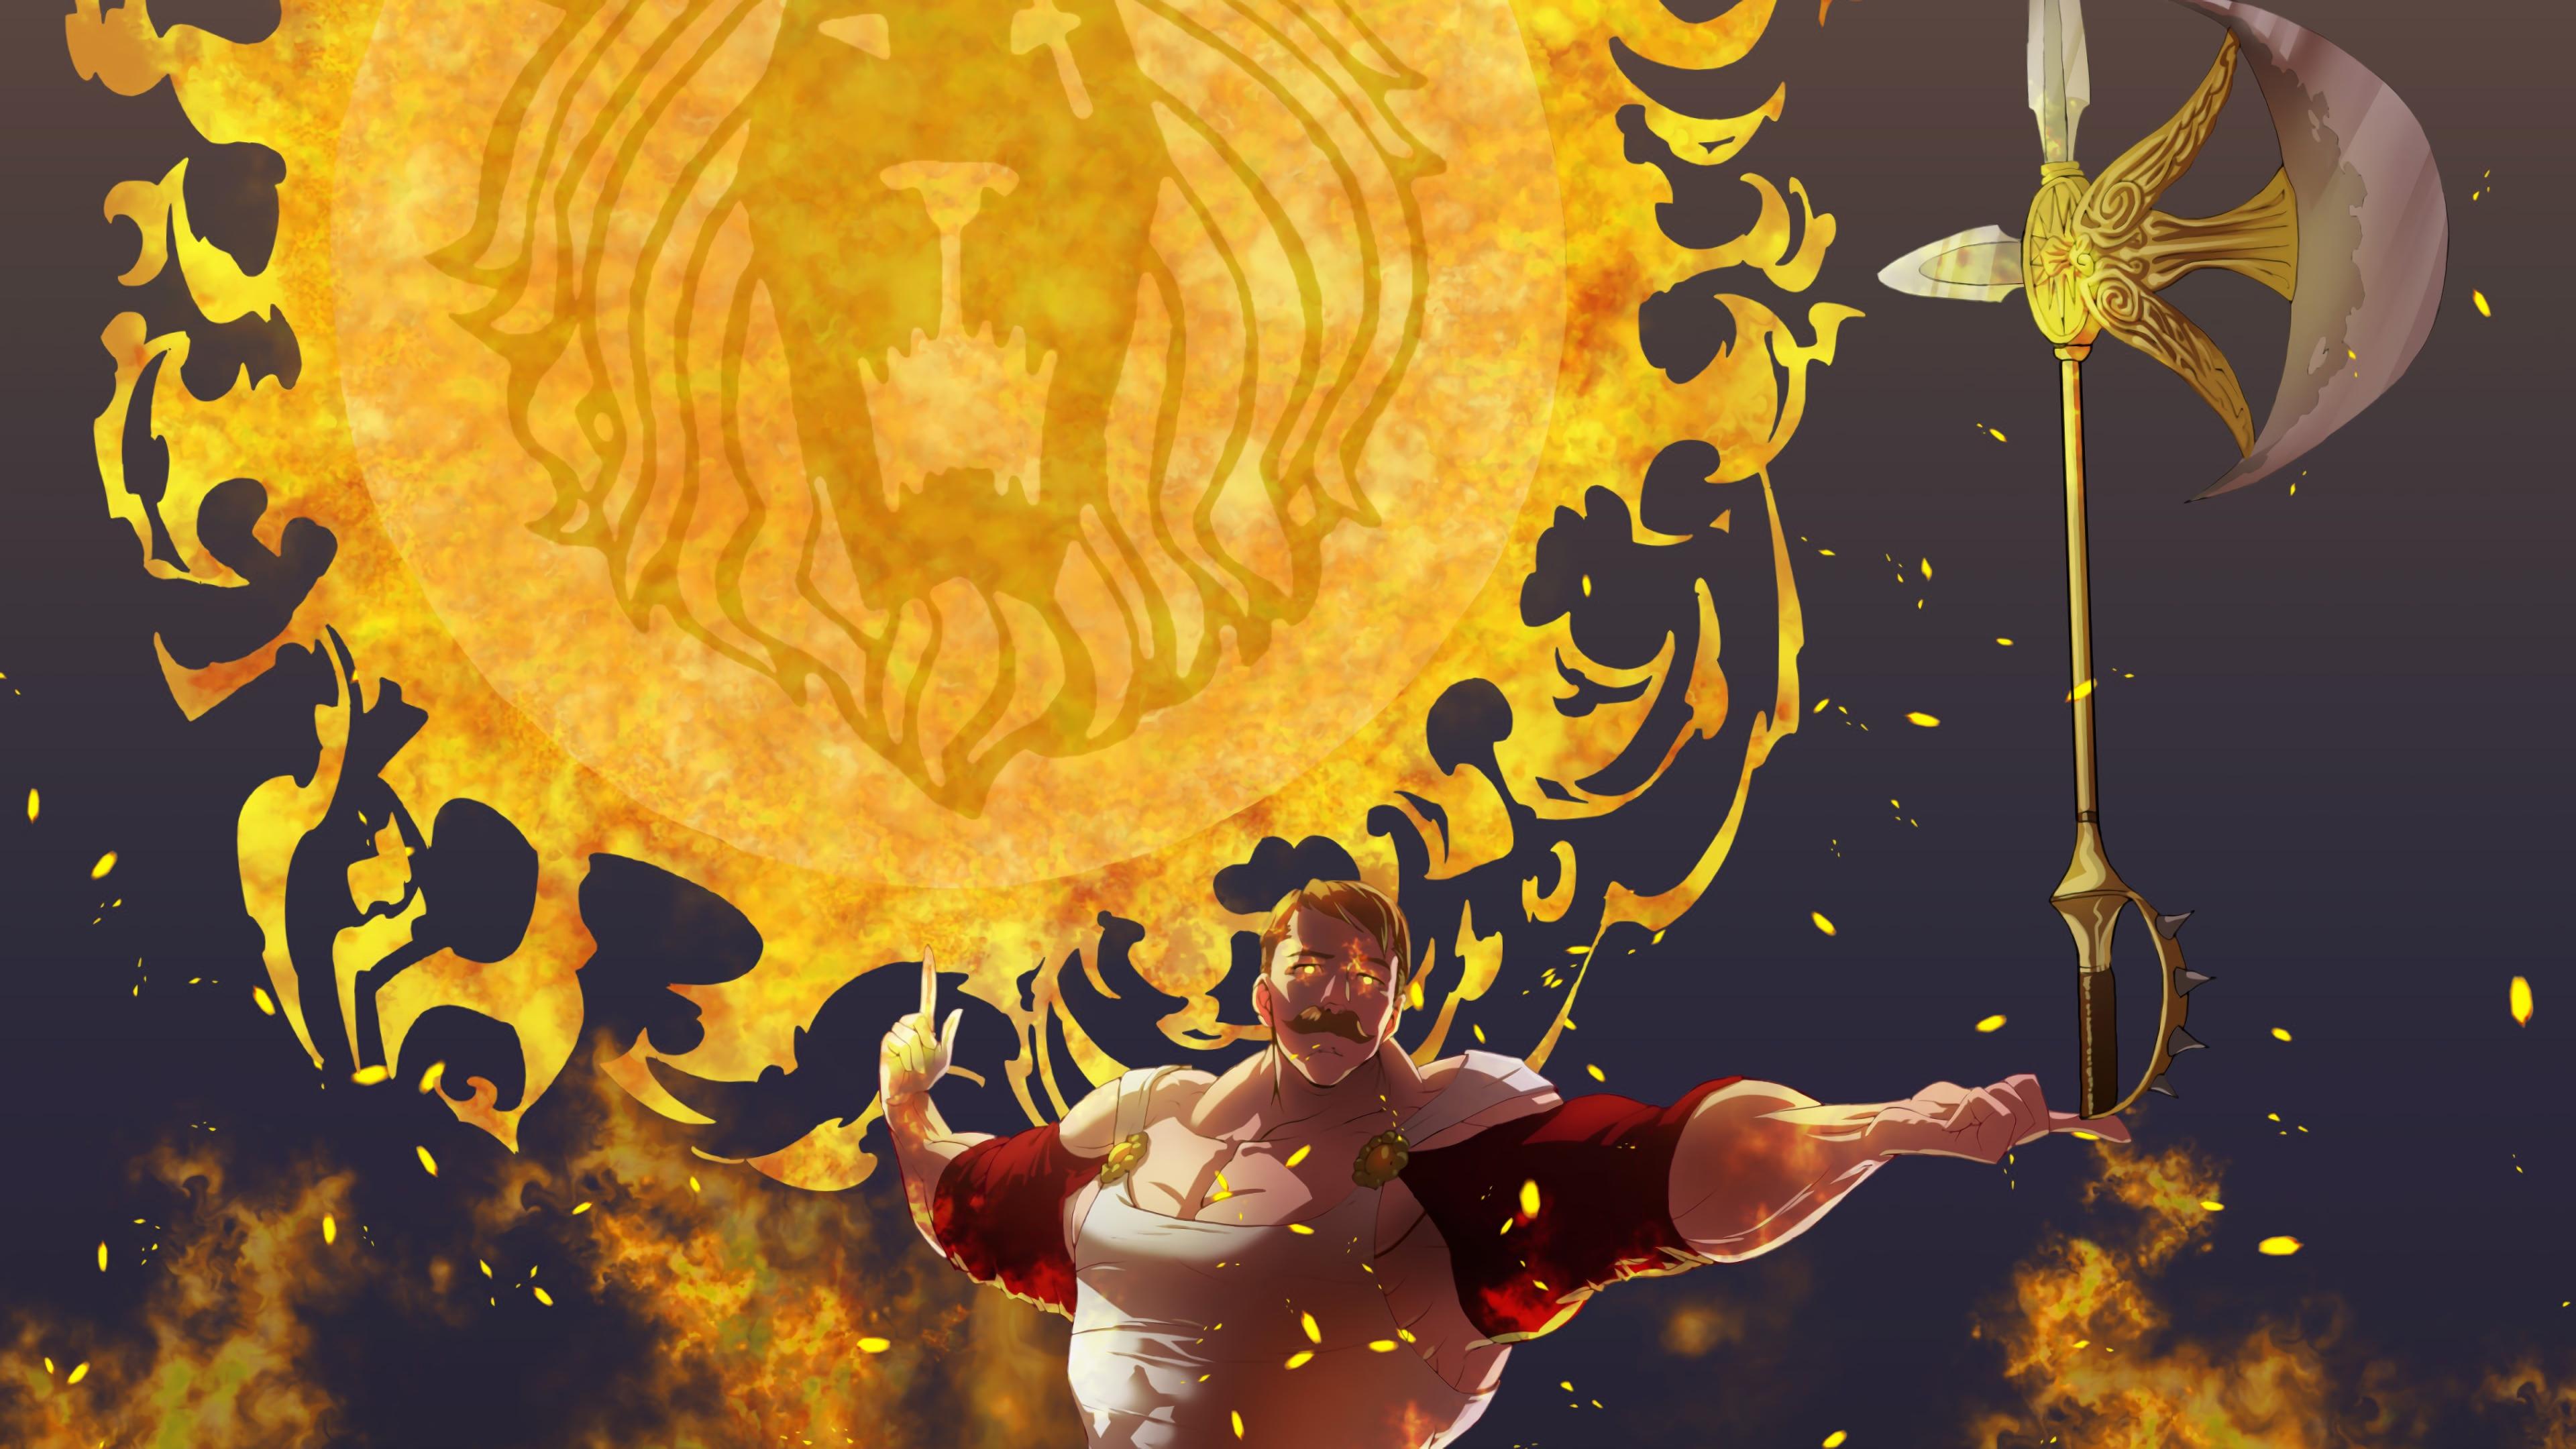 The Seven Deadly Sins 4k Ultra HD Wallpaper | Background ...